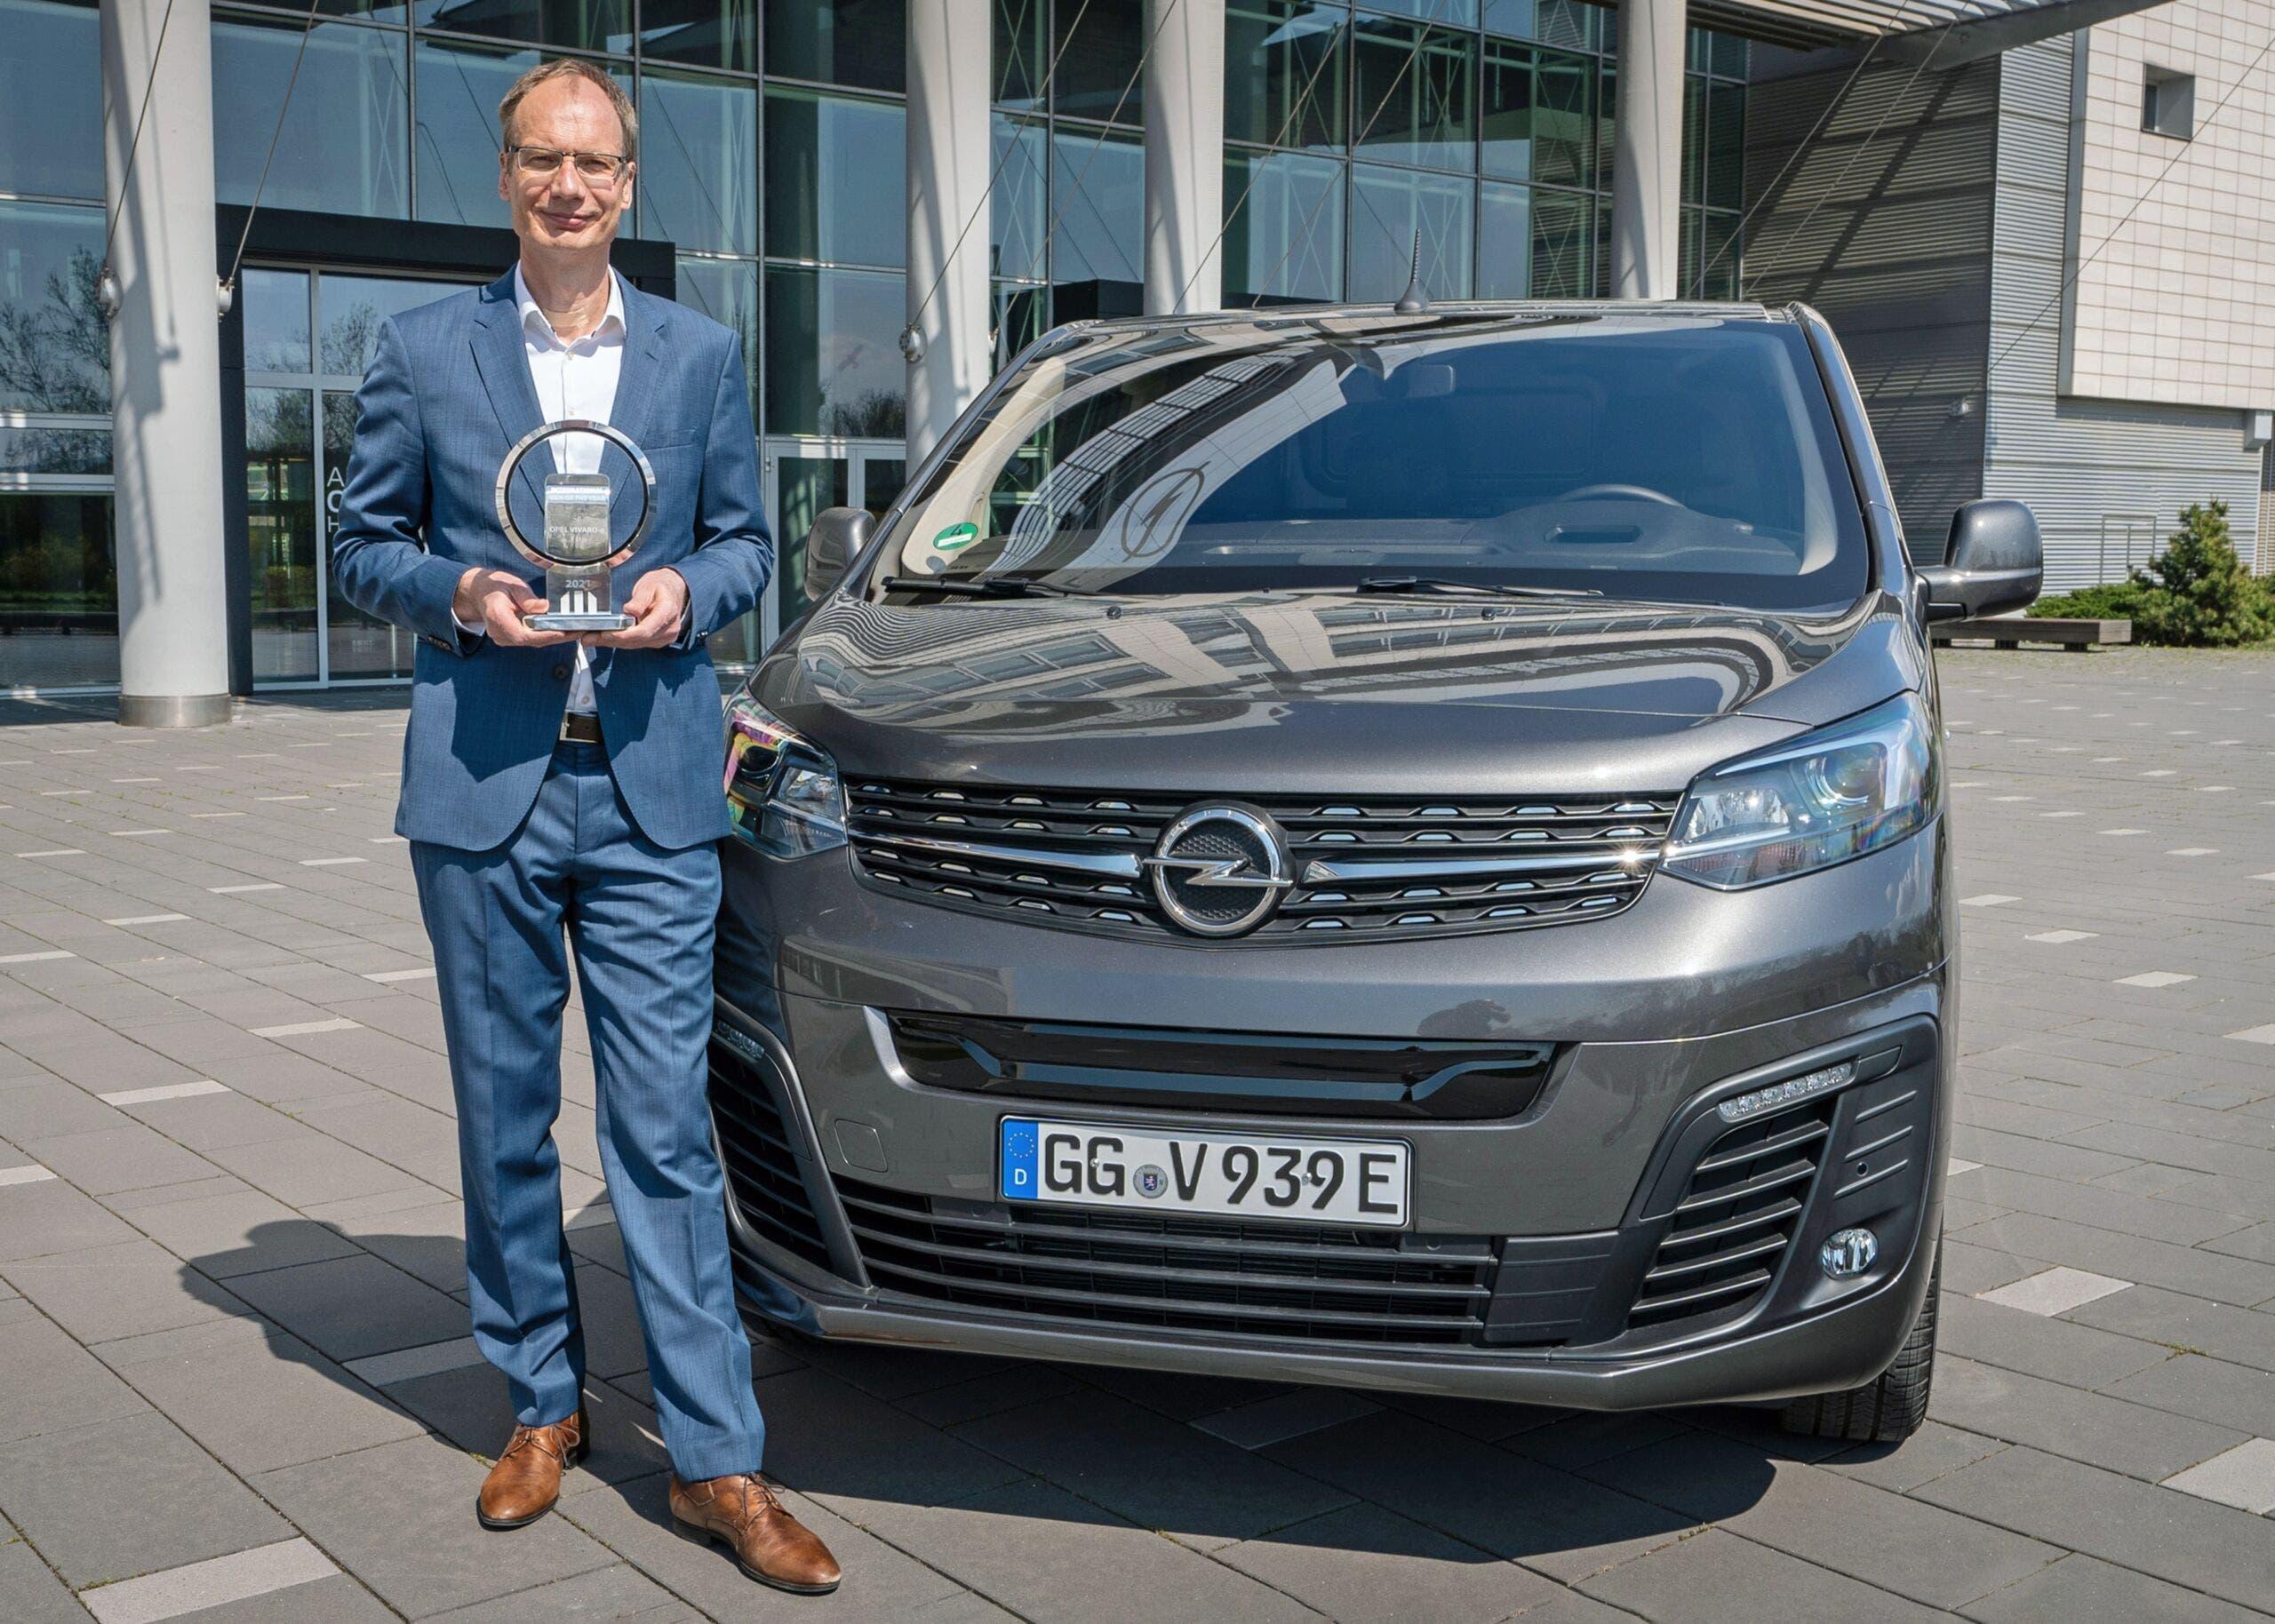 Nuovo Opel Vivaro-e International Van of The Year 2021